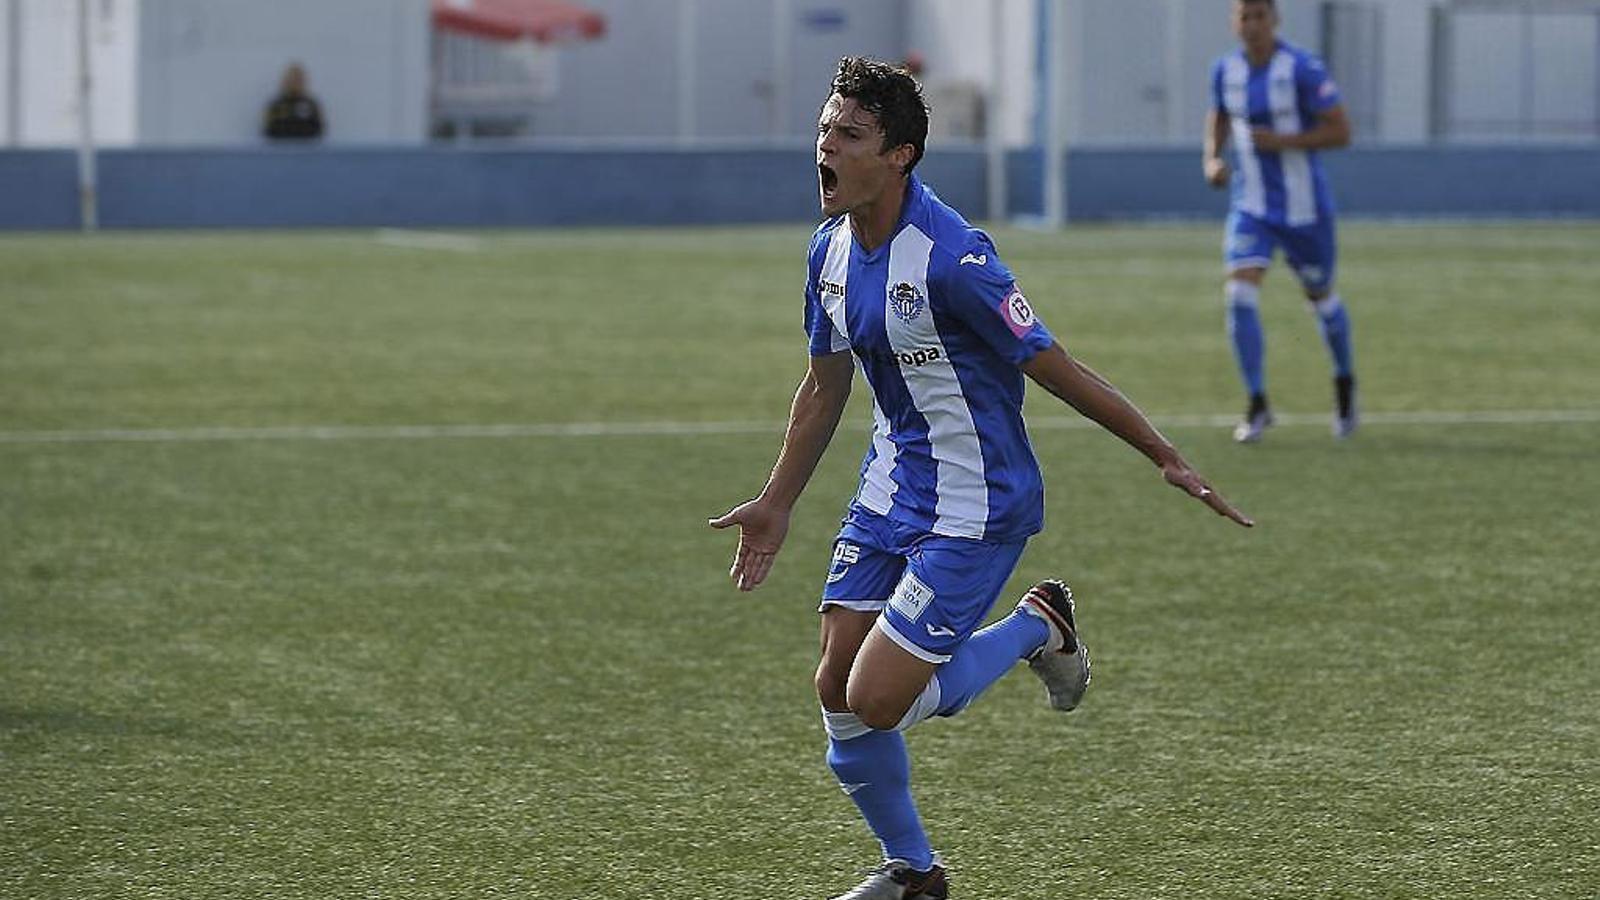 Francesc Fullana celebra un gol en el camp de Son Malferit.